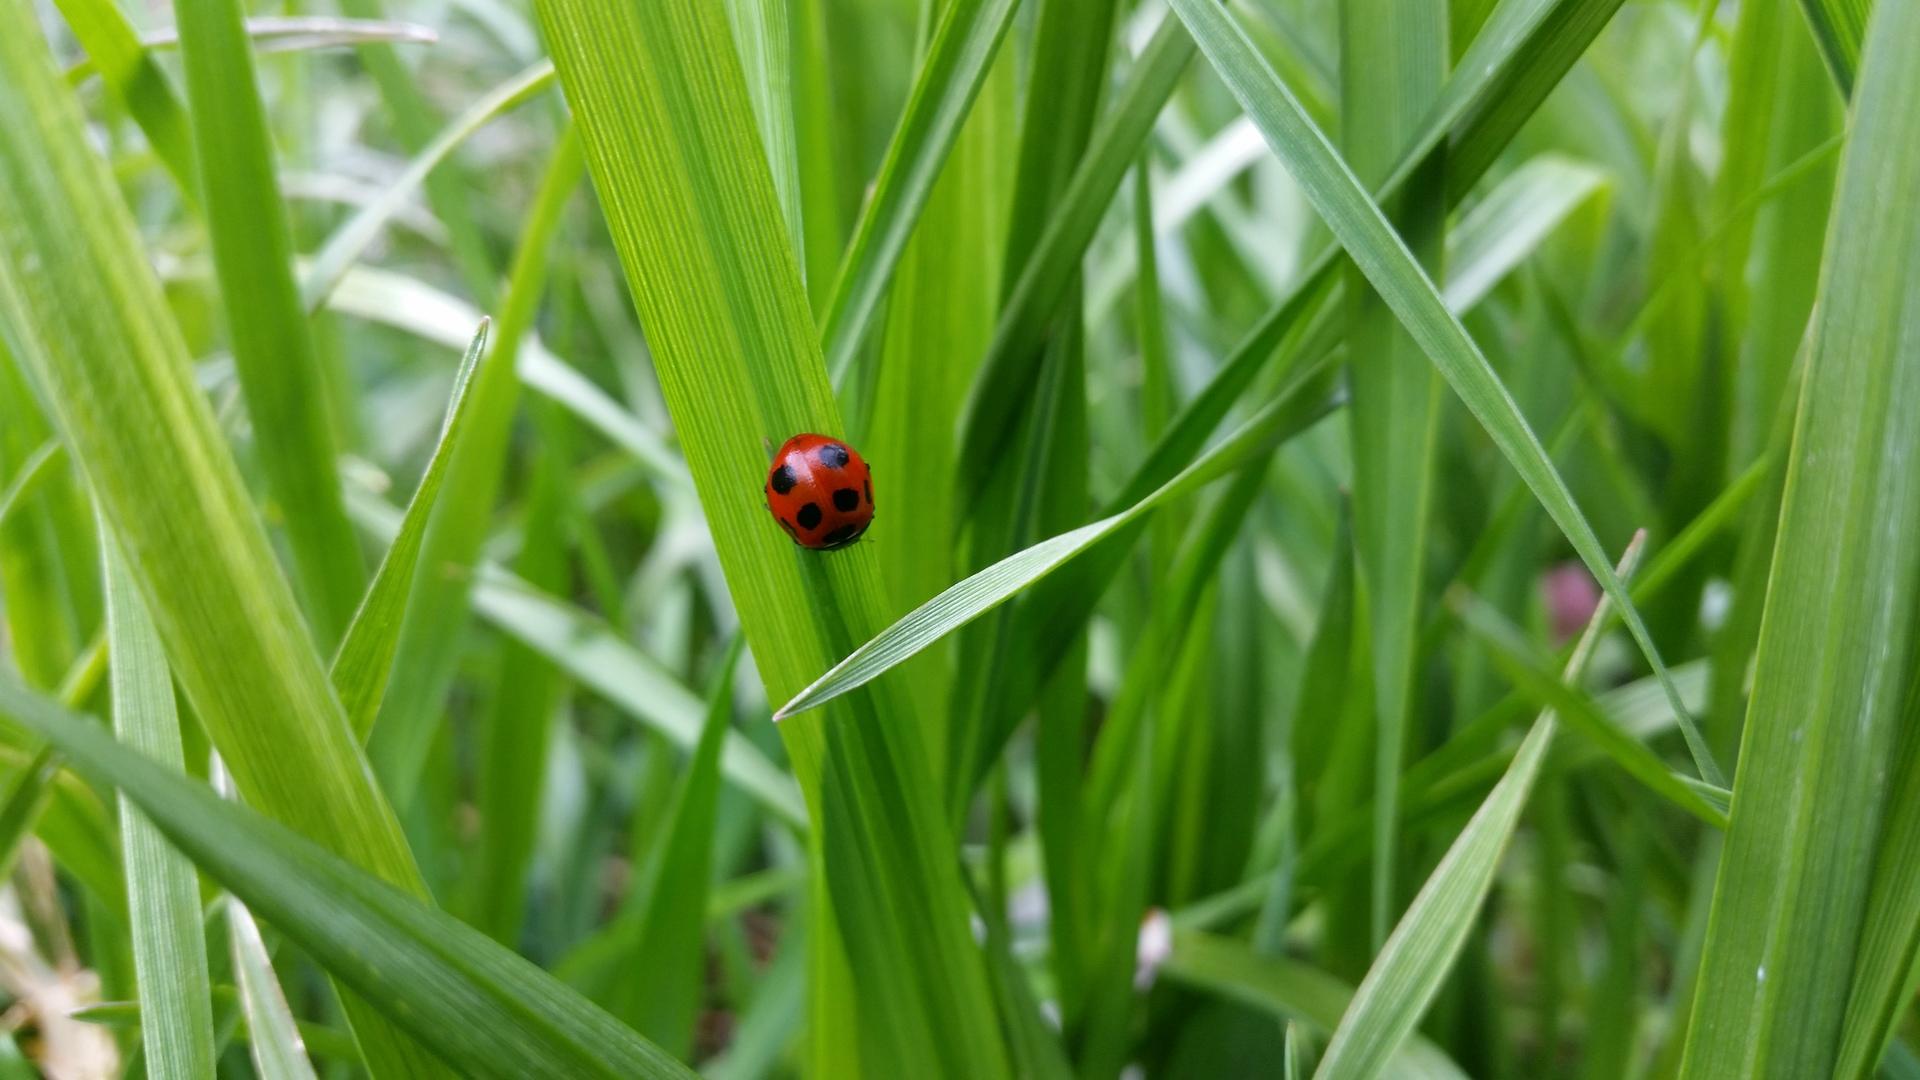 Ladybug | present4_u, environment, field, garden